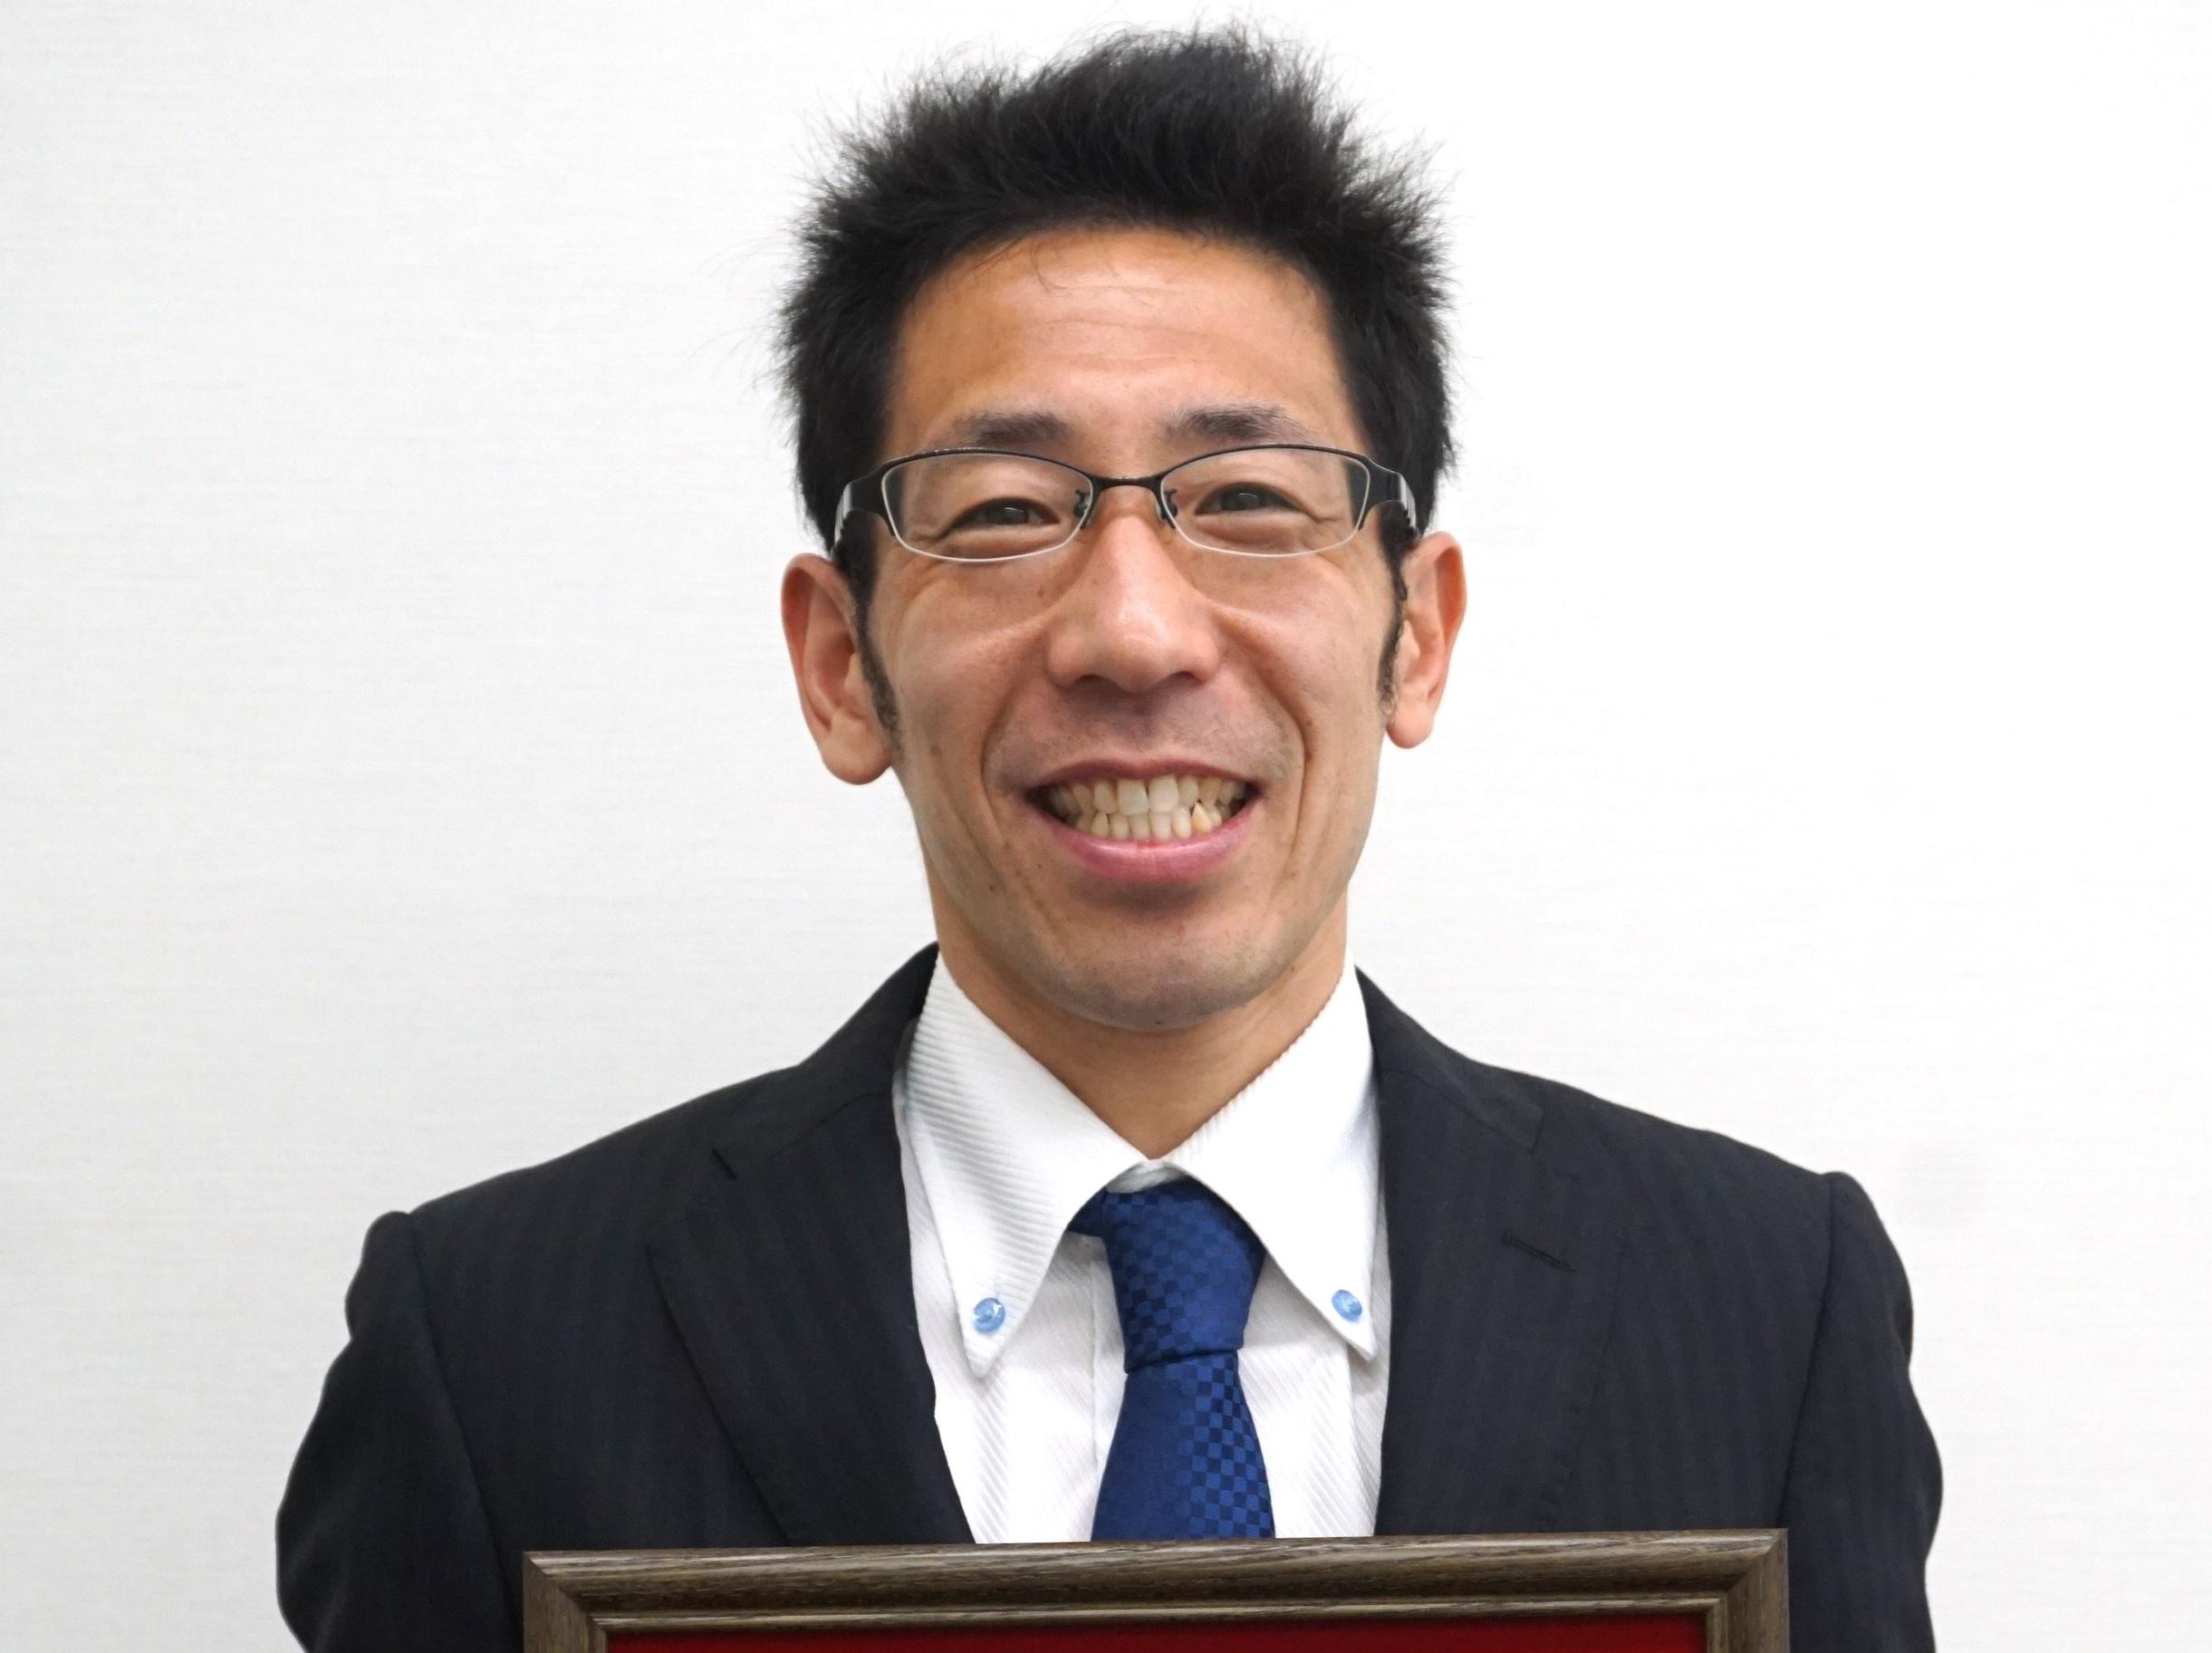 5000m元日本記録保持者、北京五輪代表・松宮隆行が現役引退 今後は指導に専念